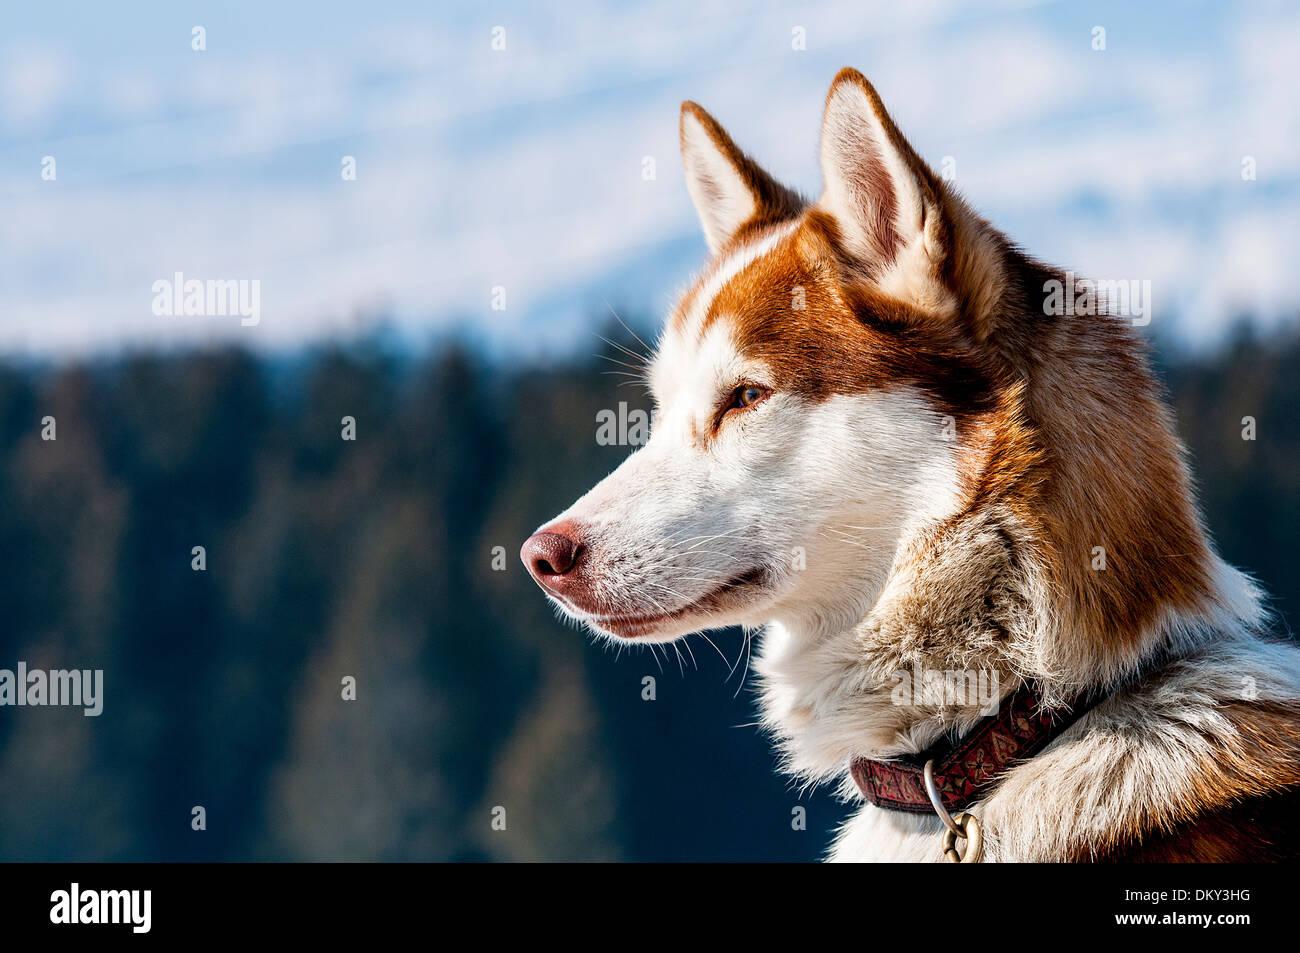 Portrait of Siberian Huskty dog in winter - Stock Image